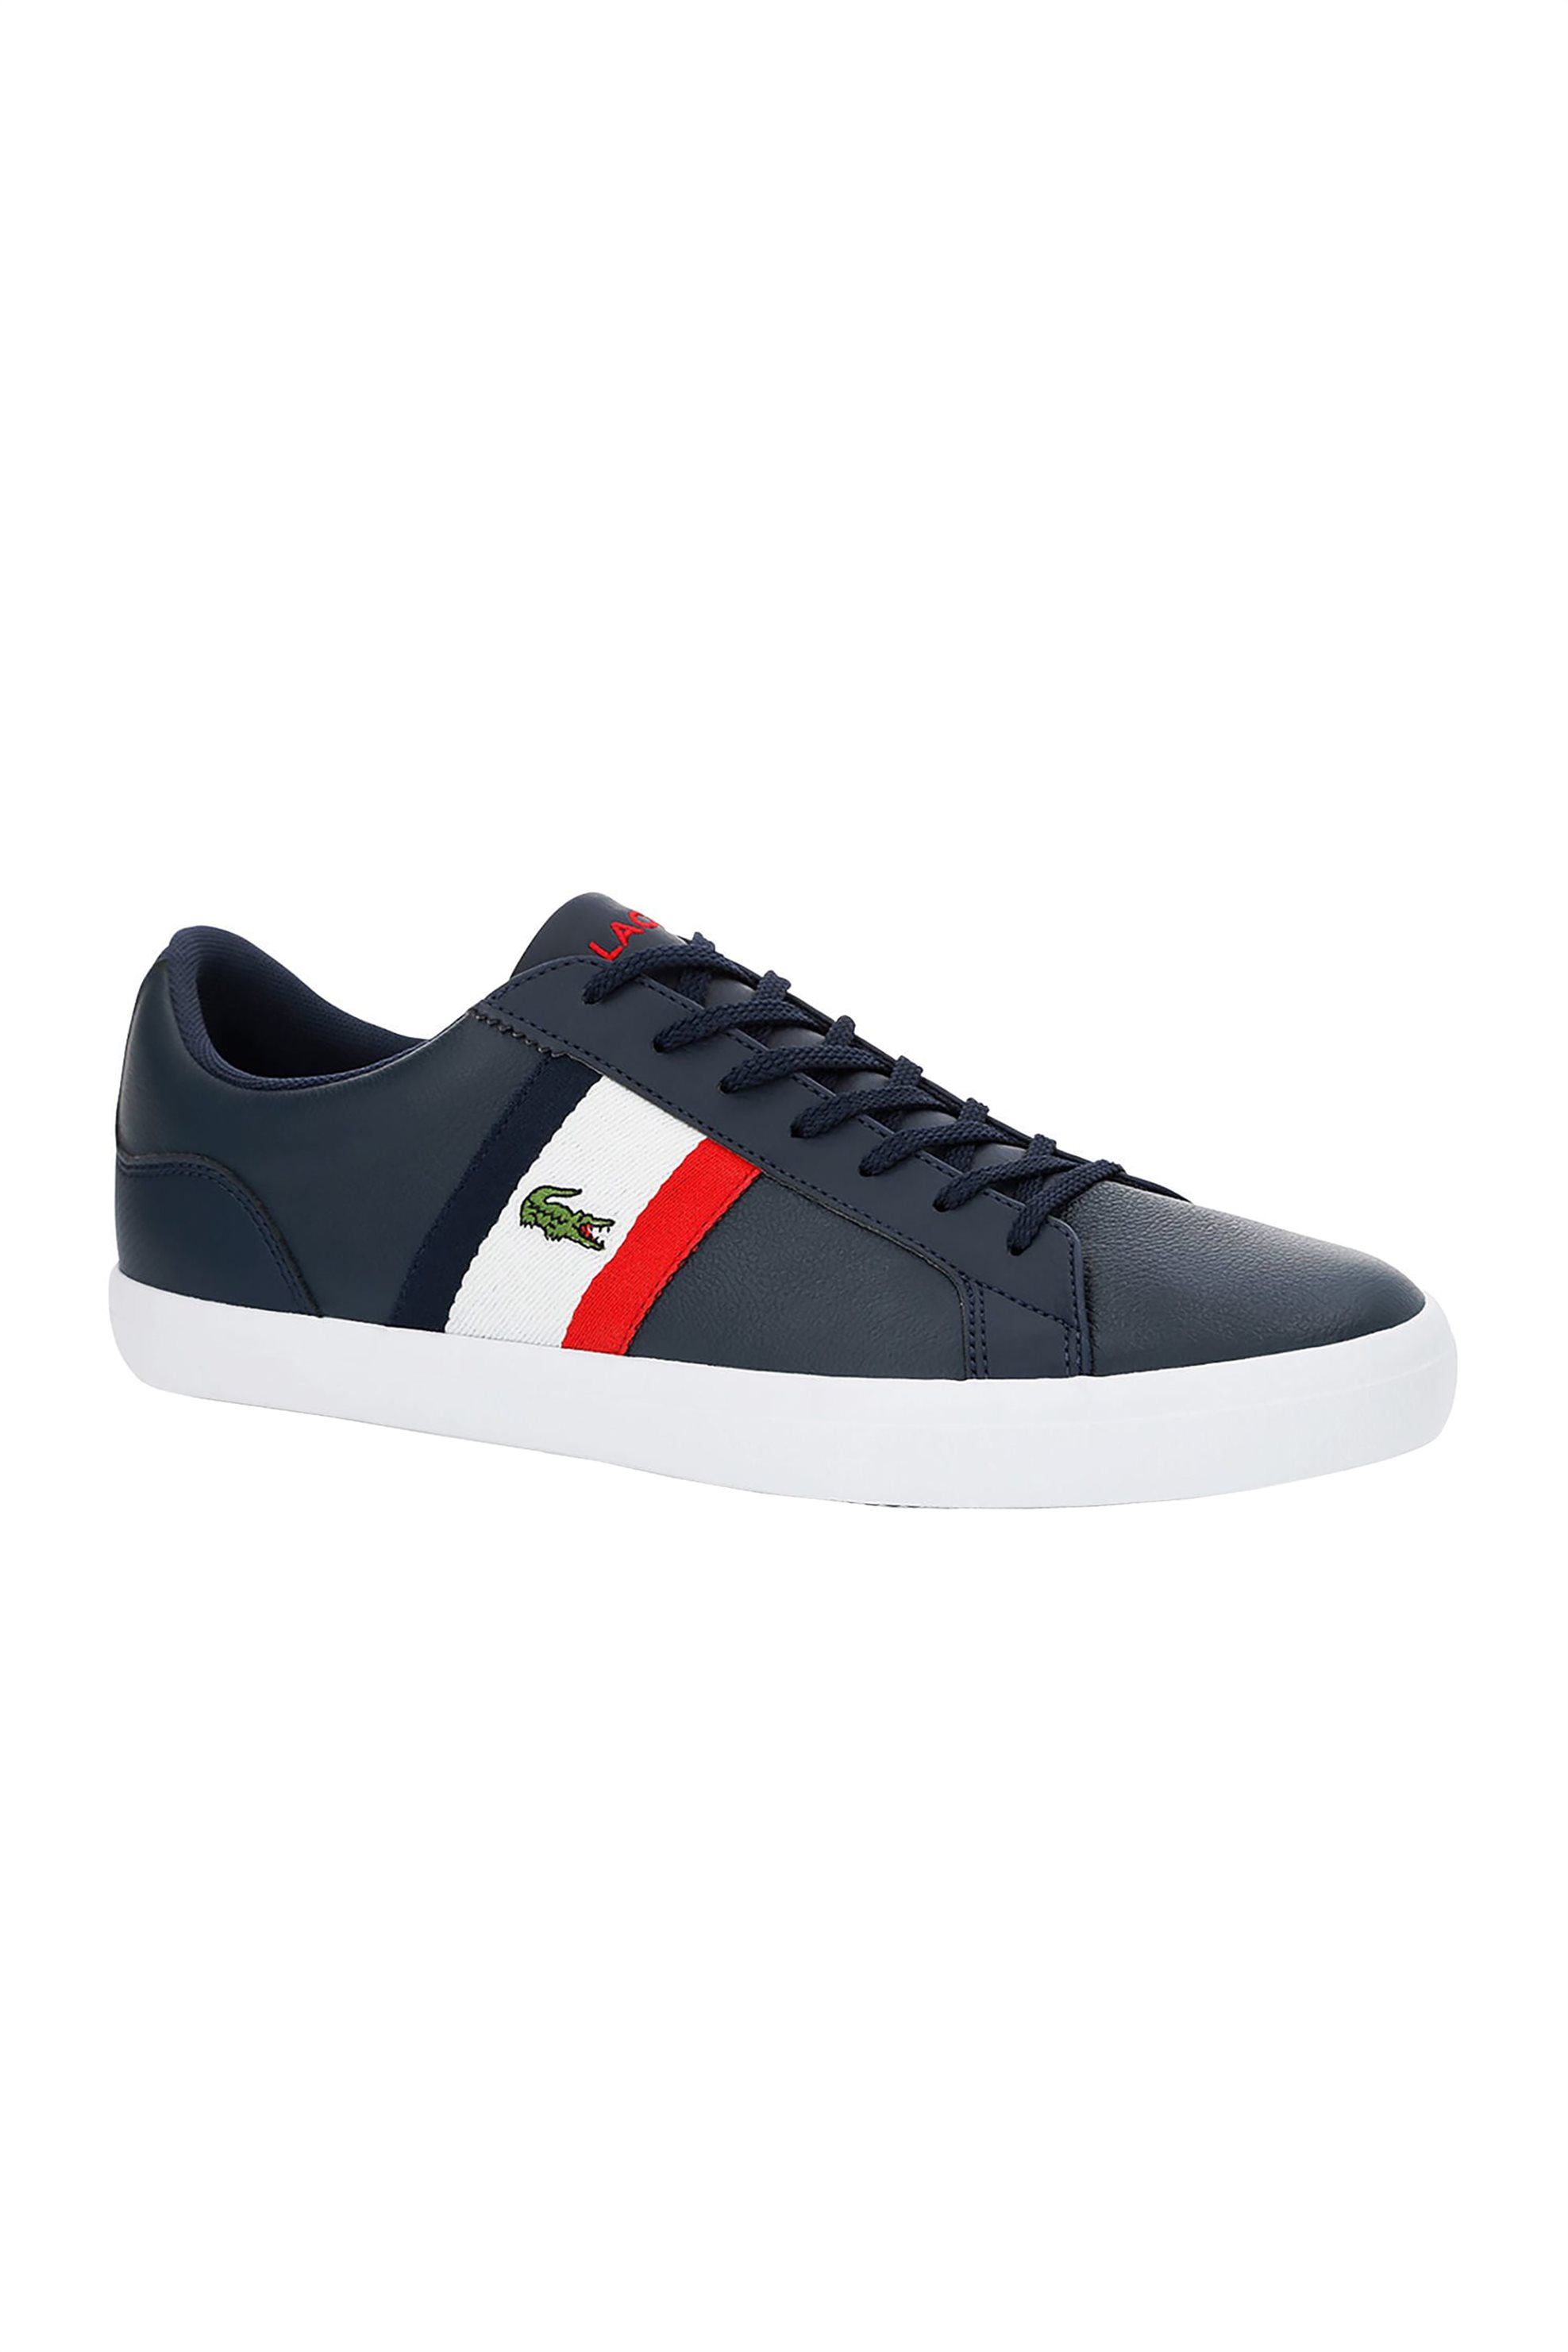 Lacoste ανδρικά sneakers με κορδόνια Lerond – 37CMA00457A2 – Μπλε Σκούρο